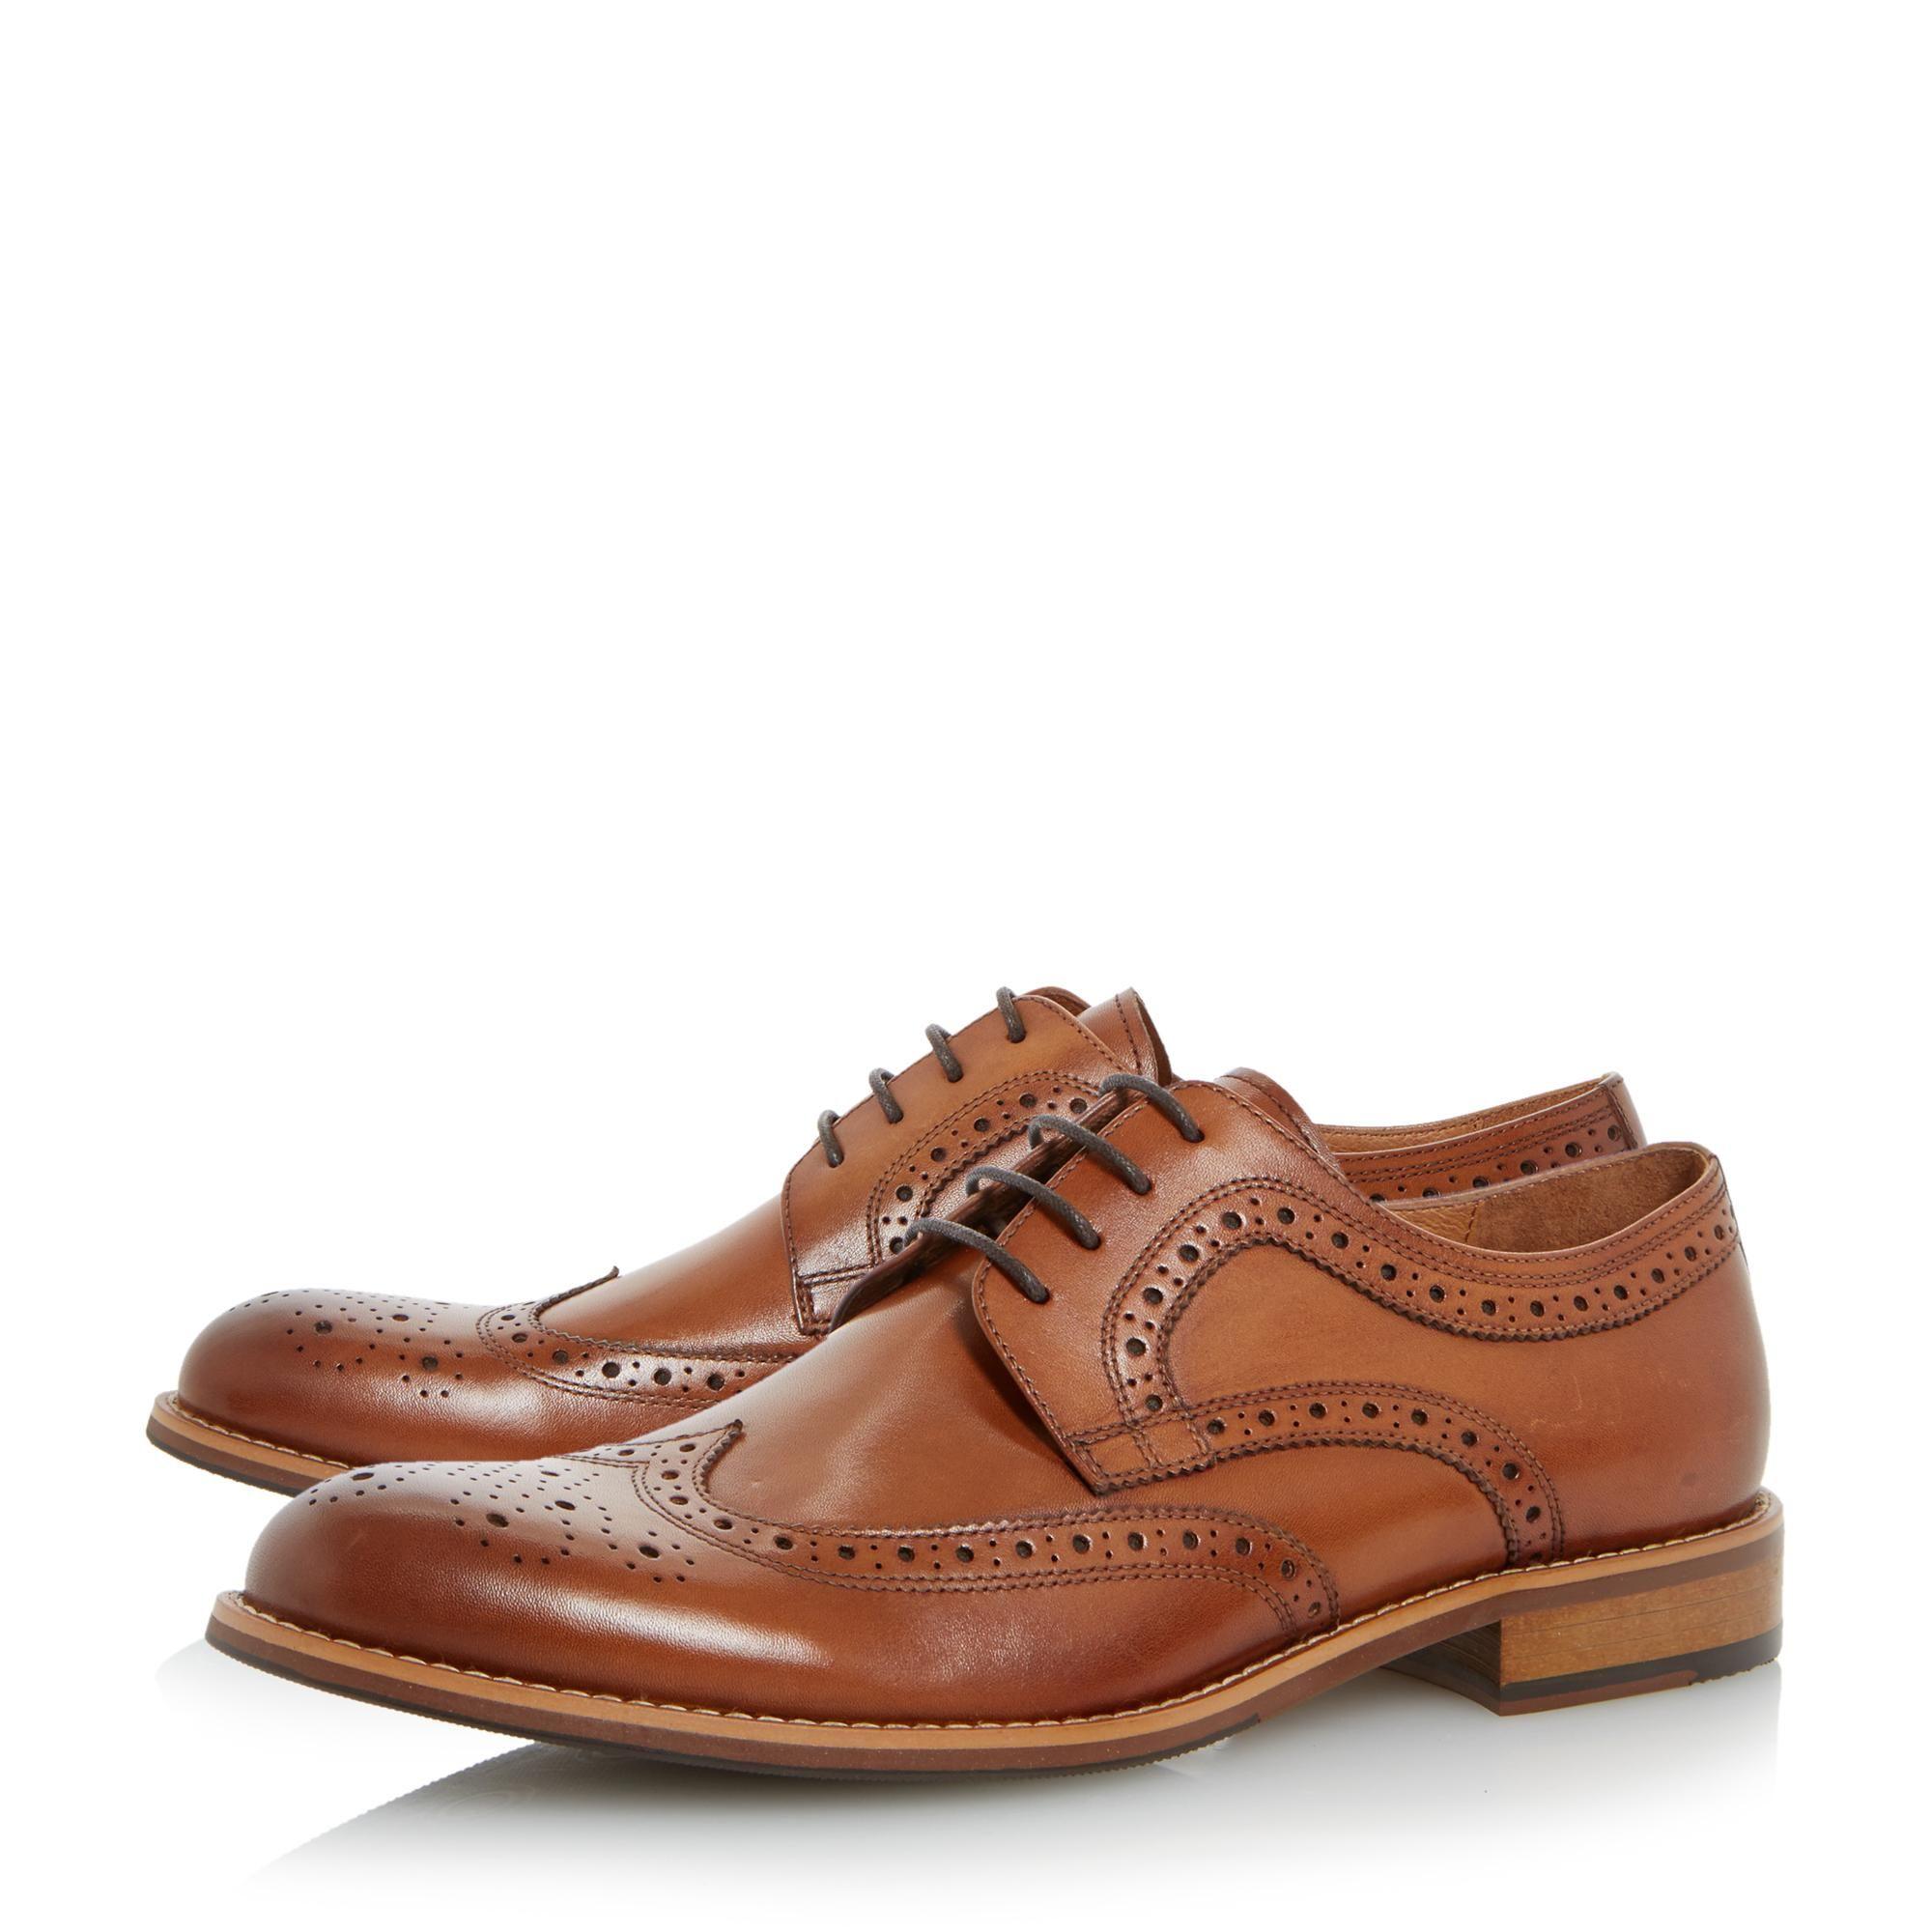 Dune Mens RADCLIFFE Derby Brogue Shoes